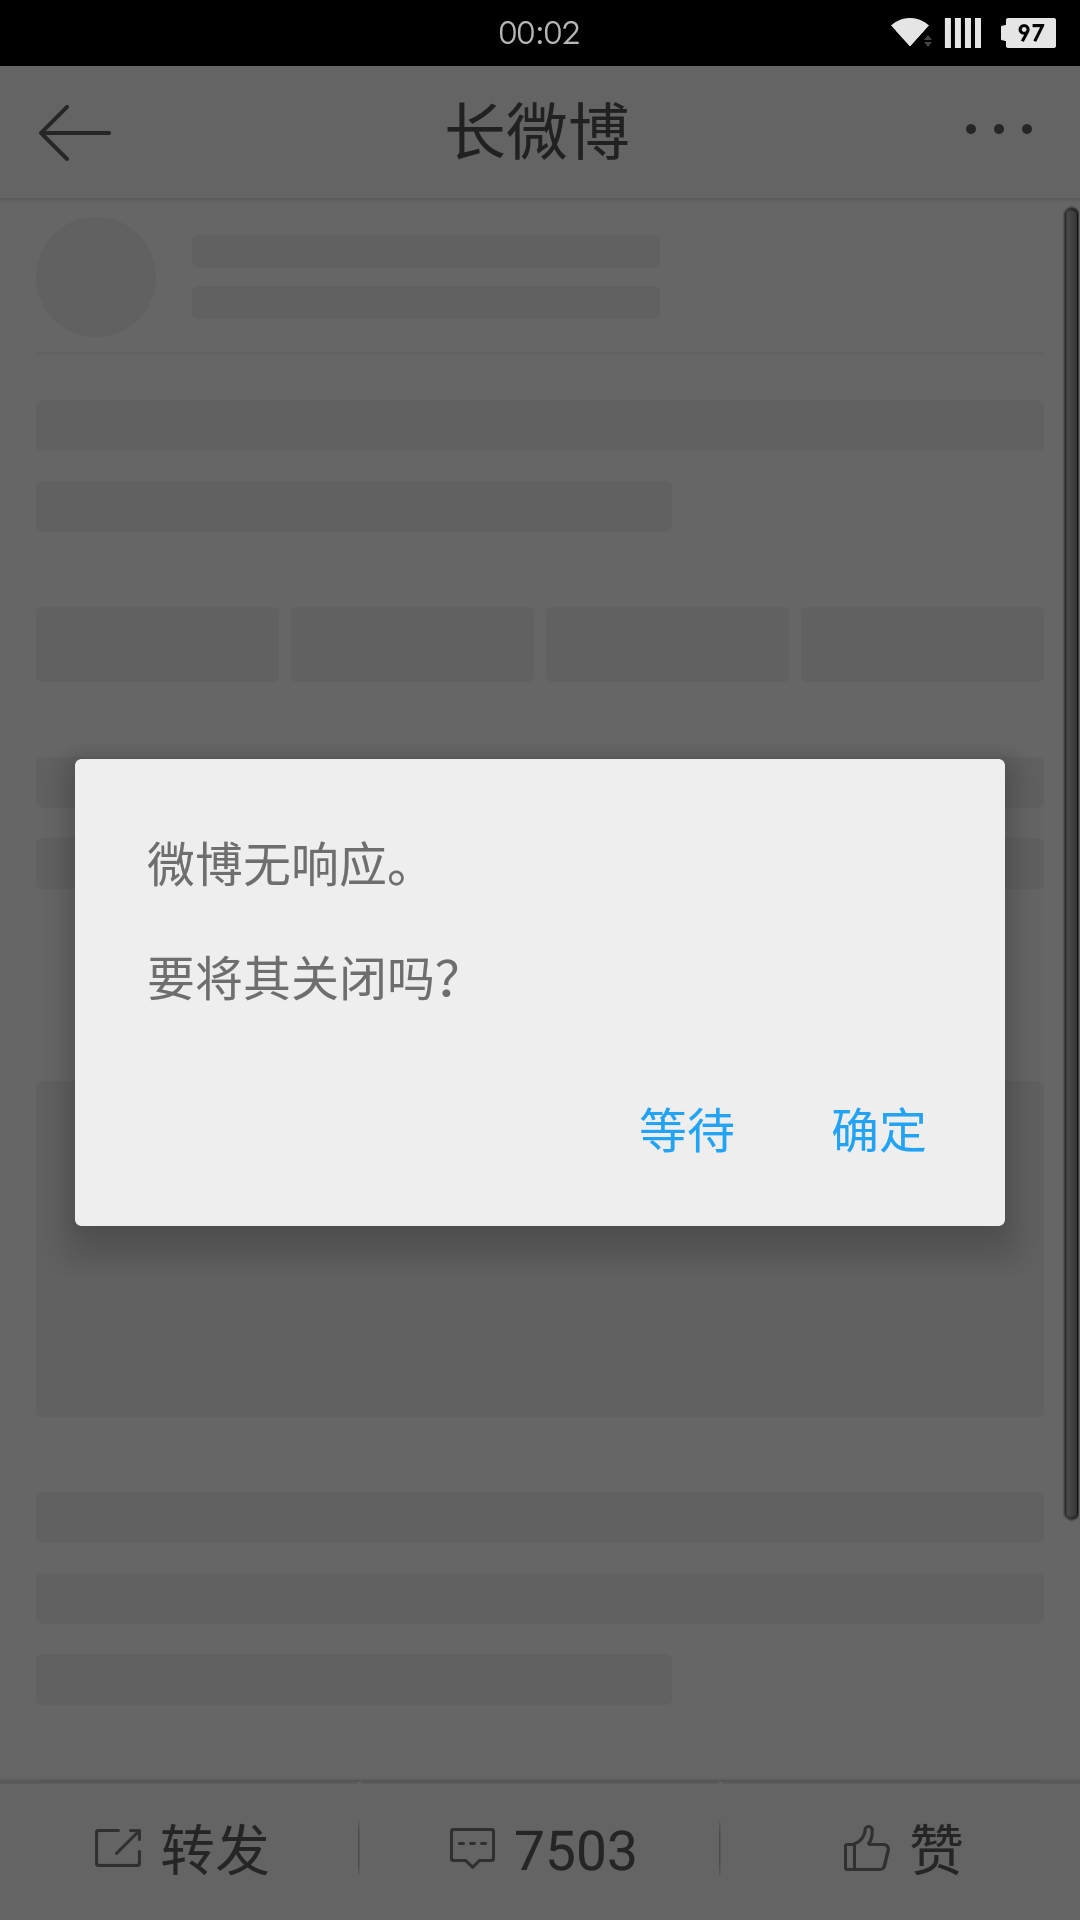 Screenshot_2015-10-25-00-02-33.png